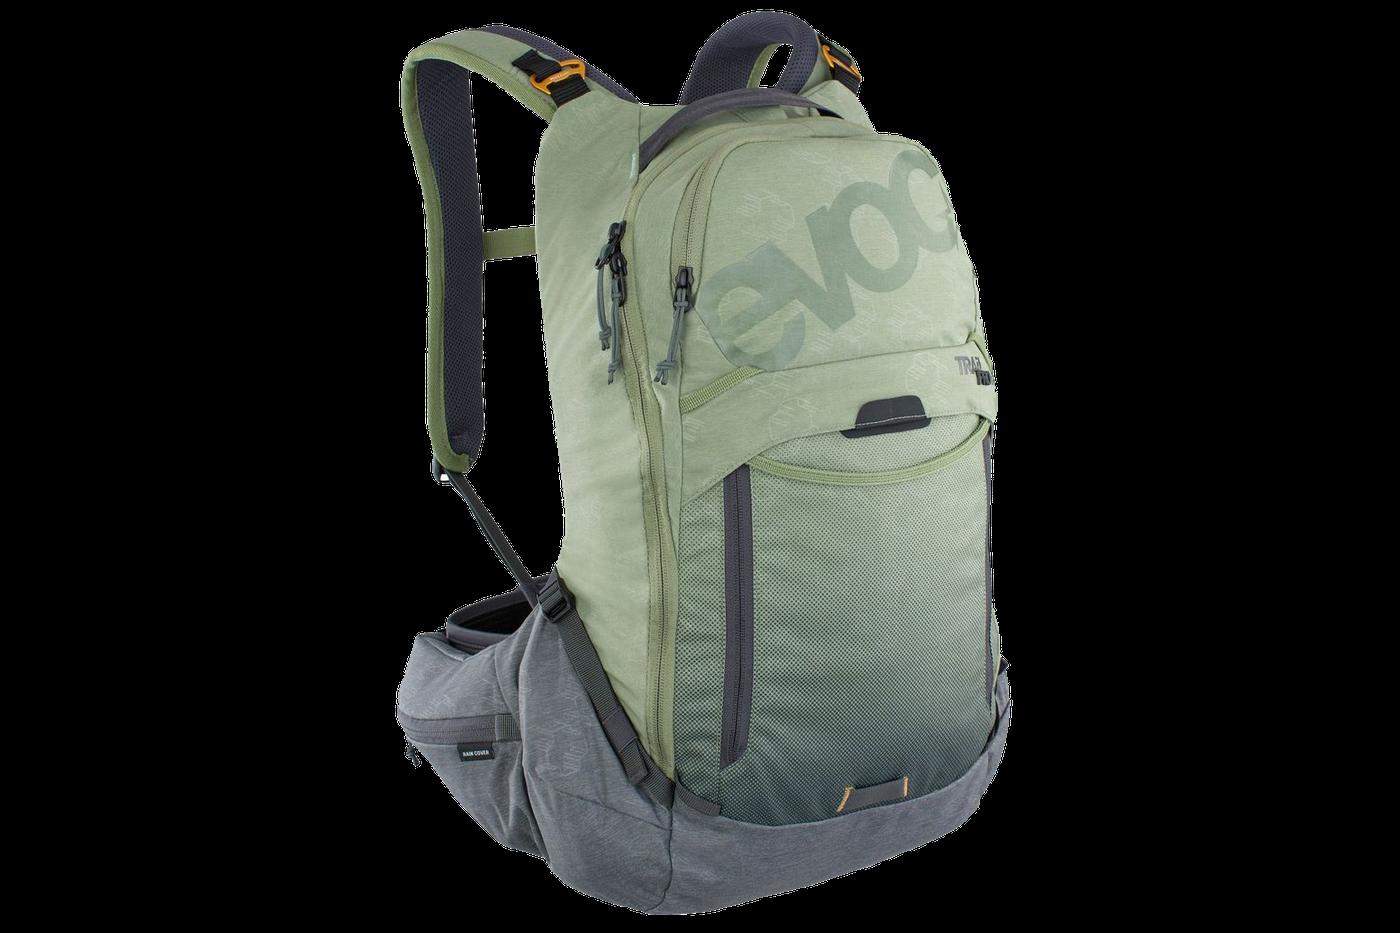 Evoc's New Trail Pro 10, 16, 26-liter Protection Backpacks